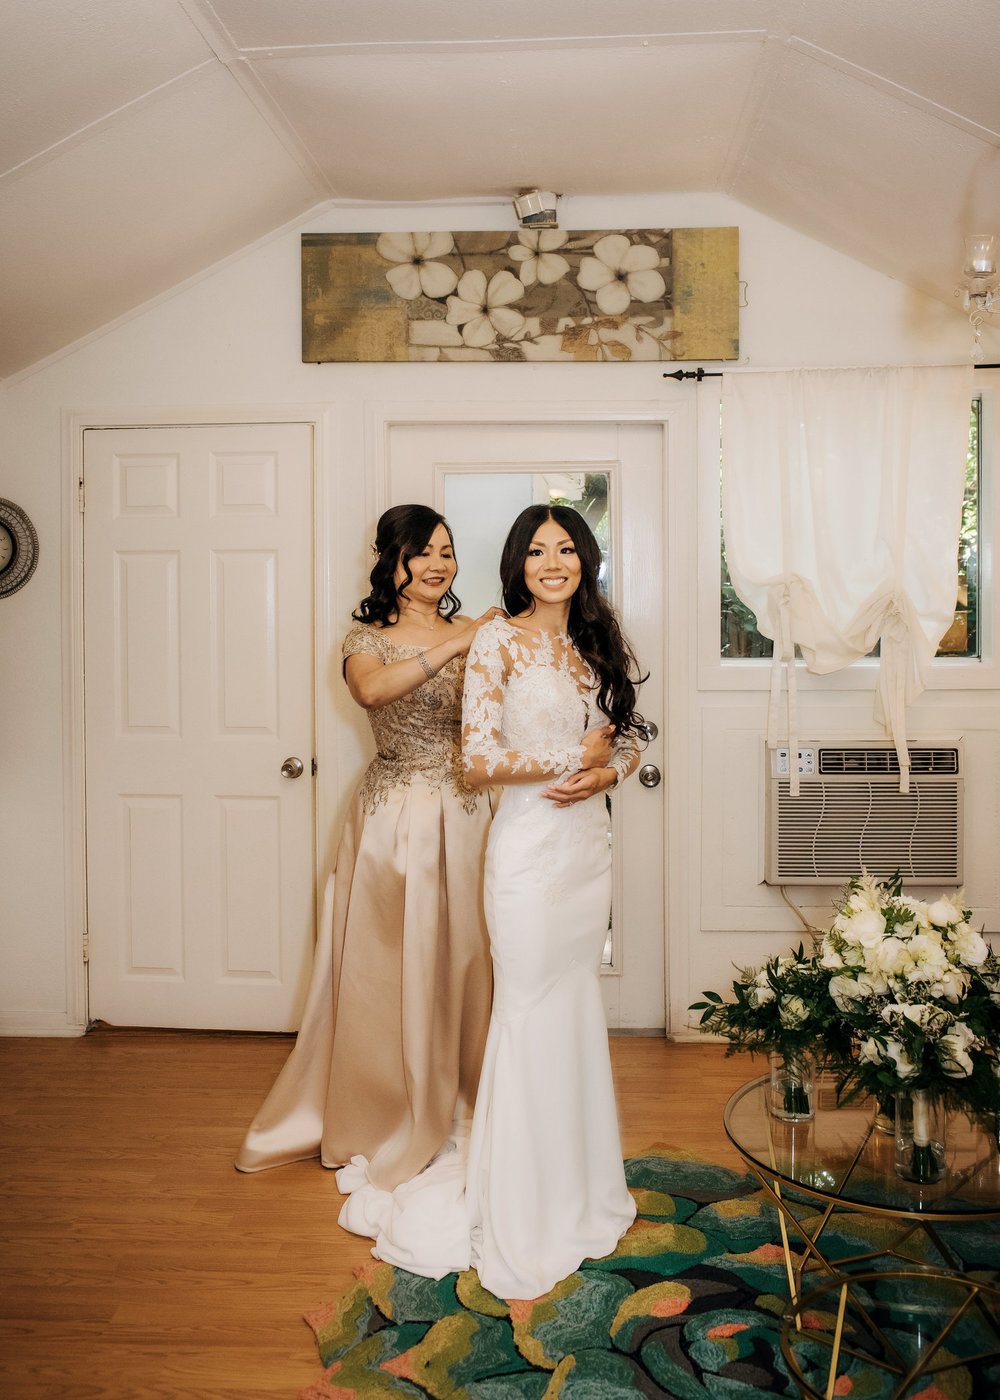 Turchin_20180825_Austinae-Brent-Wedding_093.jpg